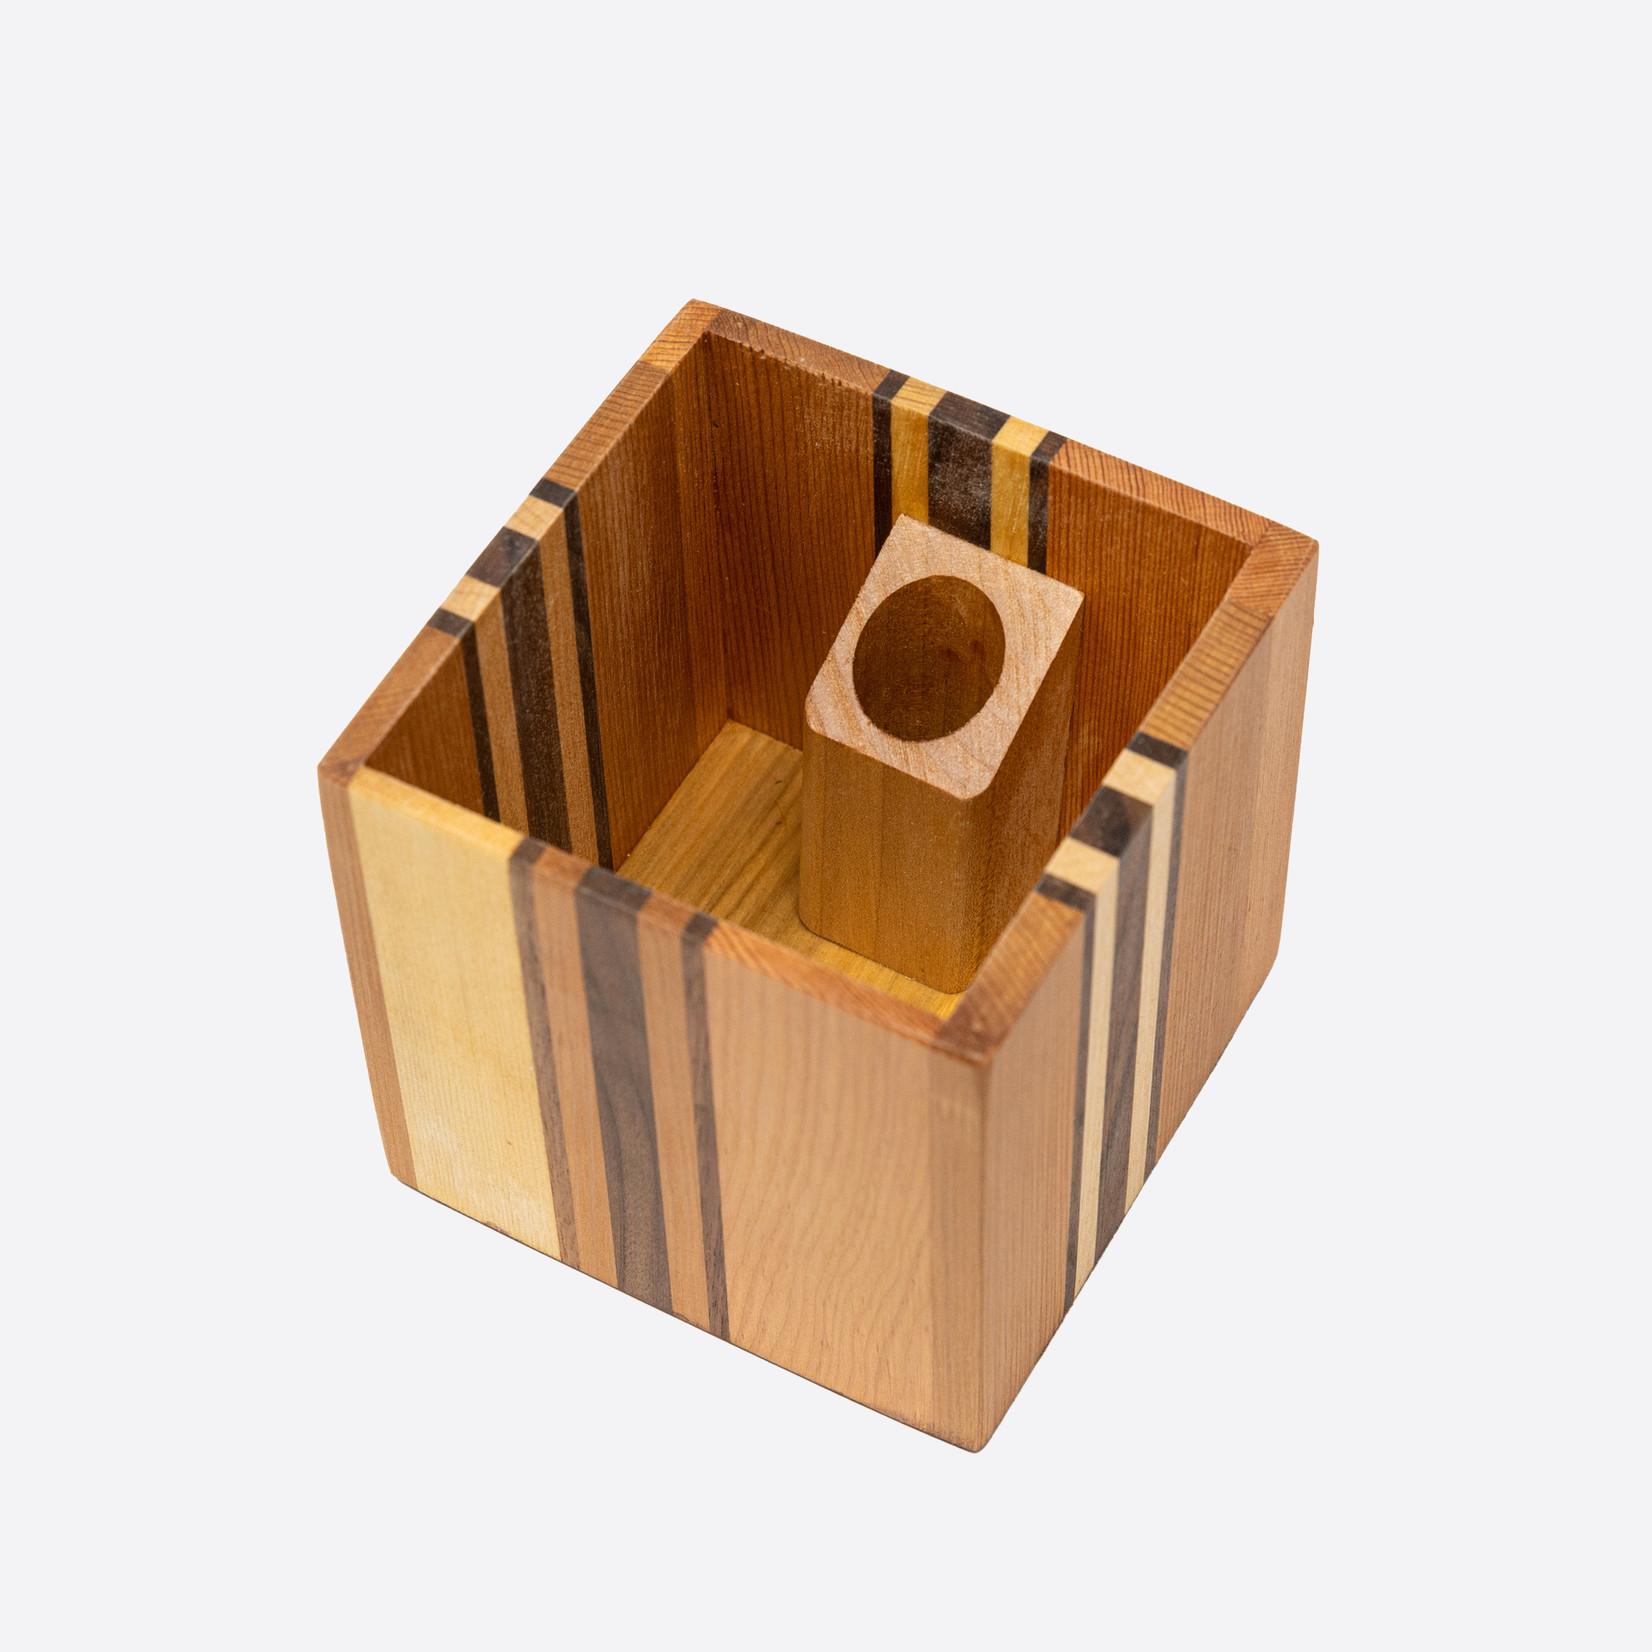 Gerry's Treasure Boxes Q-Tip Box